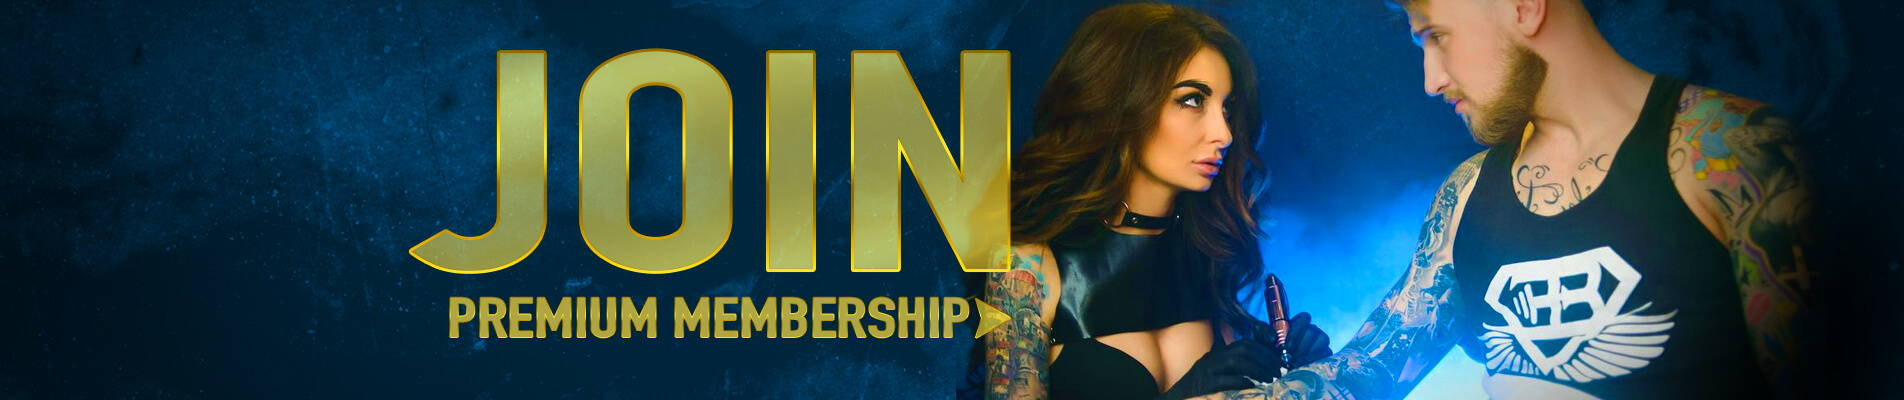 INTENZE Tattoo Ink Premium Membership Join Today